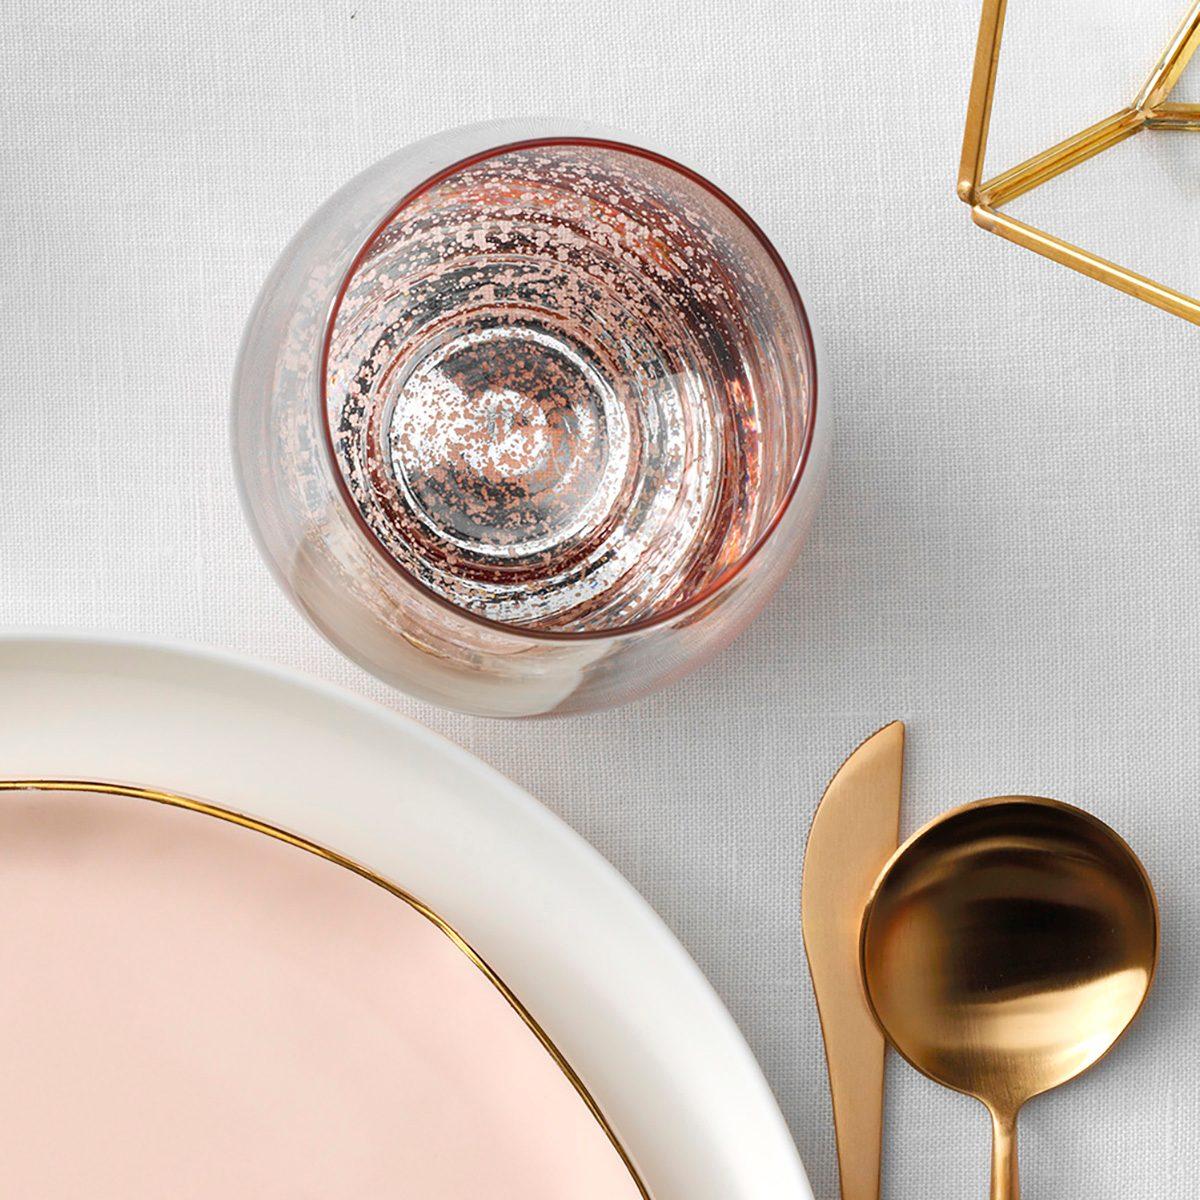 Simply Beautiful Wine Glasses